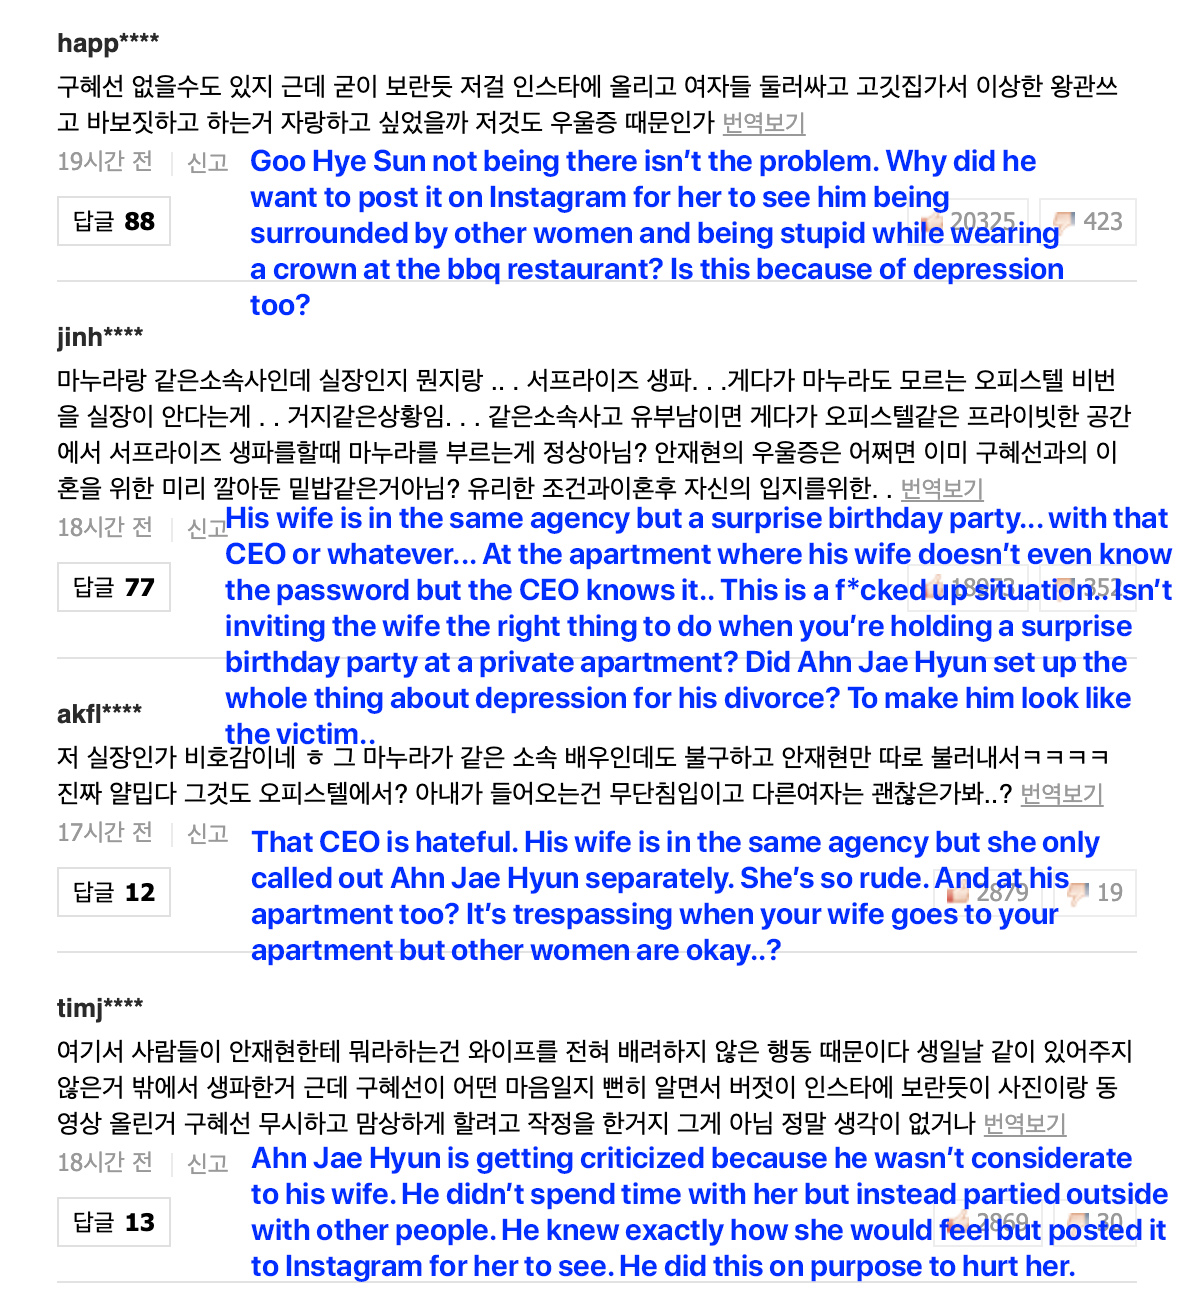 ahn jae hyun bday criticism